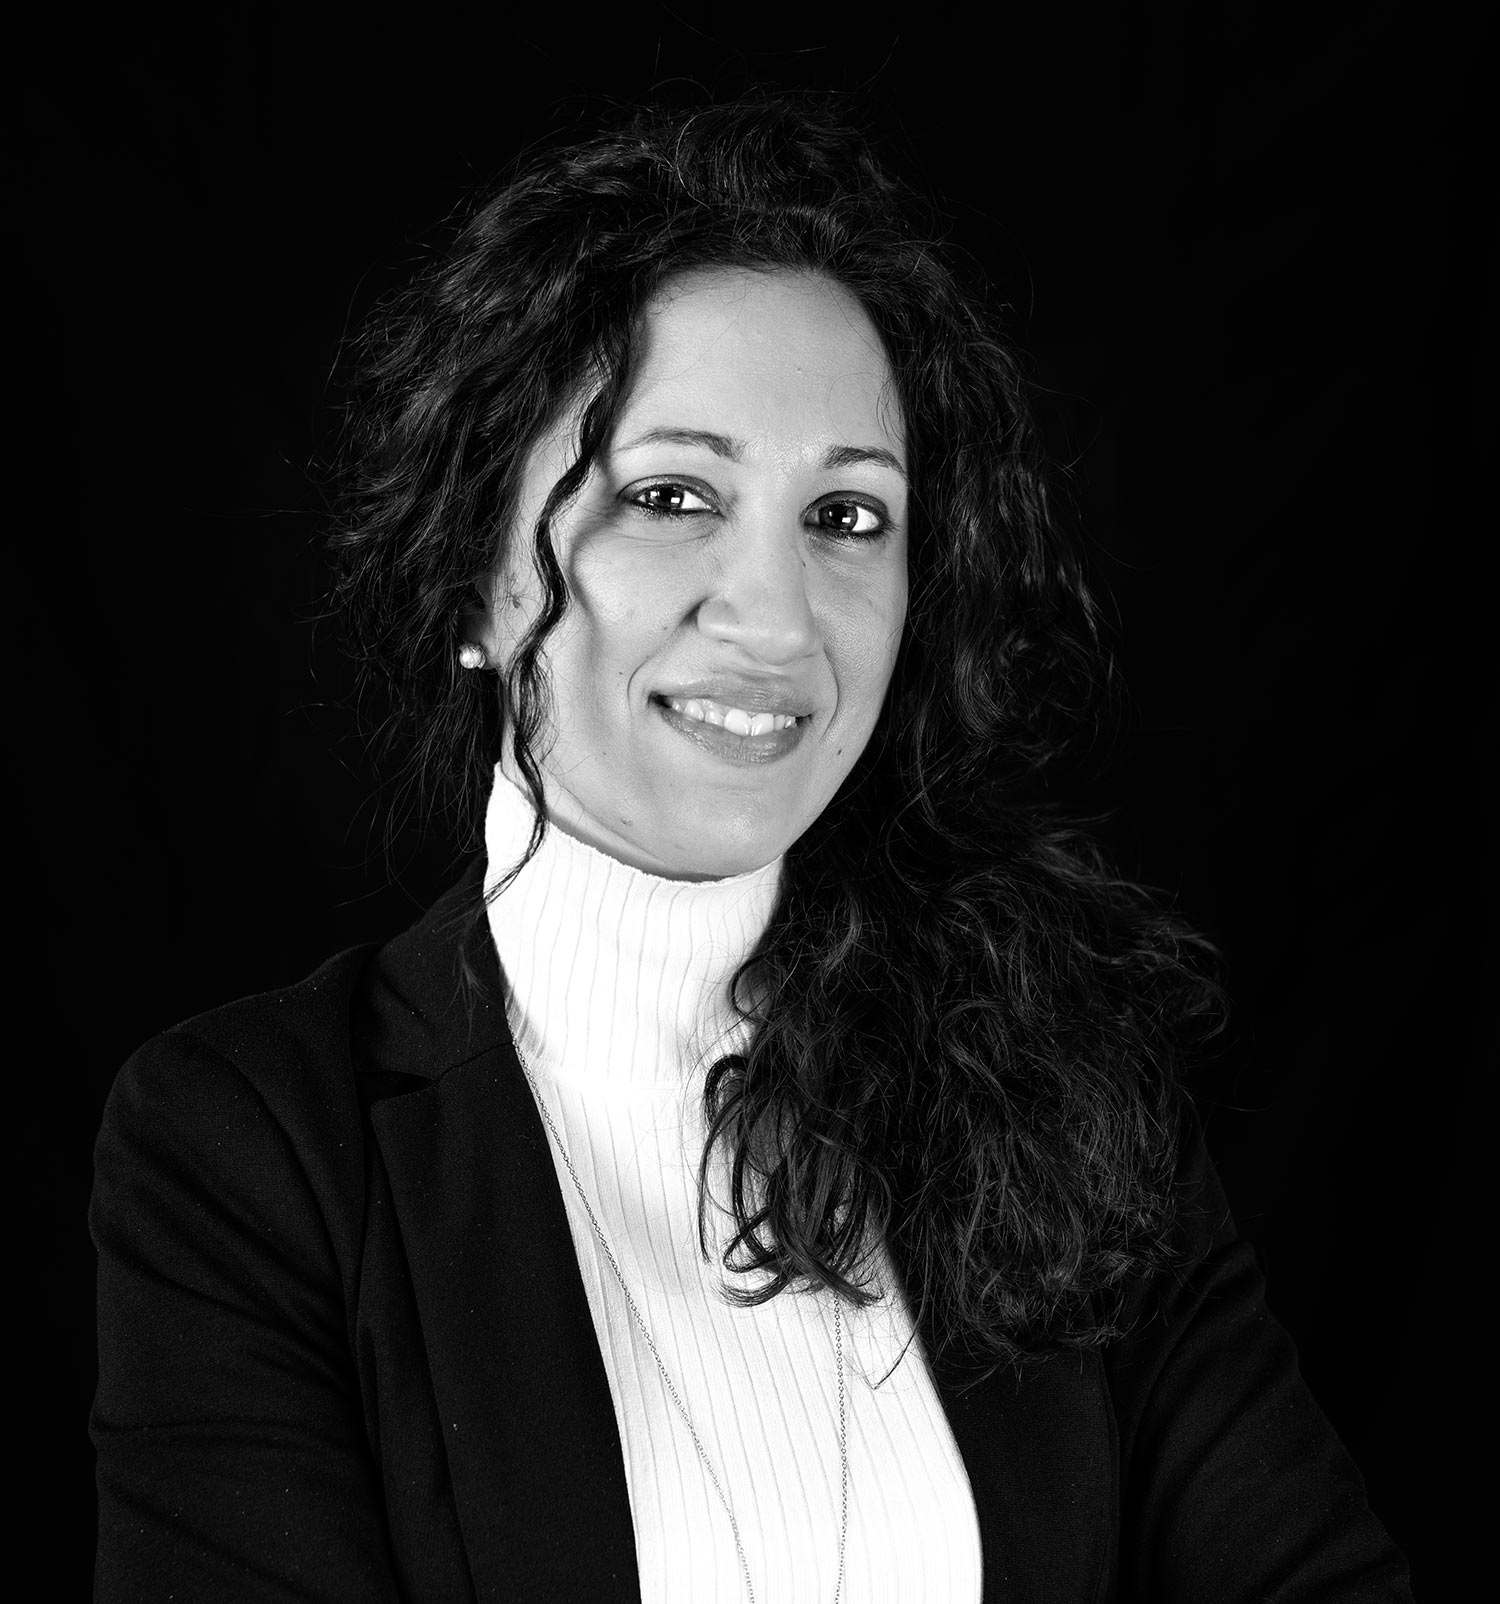 Avv. Valeria Di Girolamo